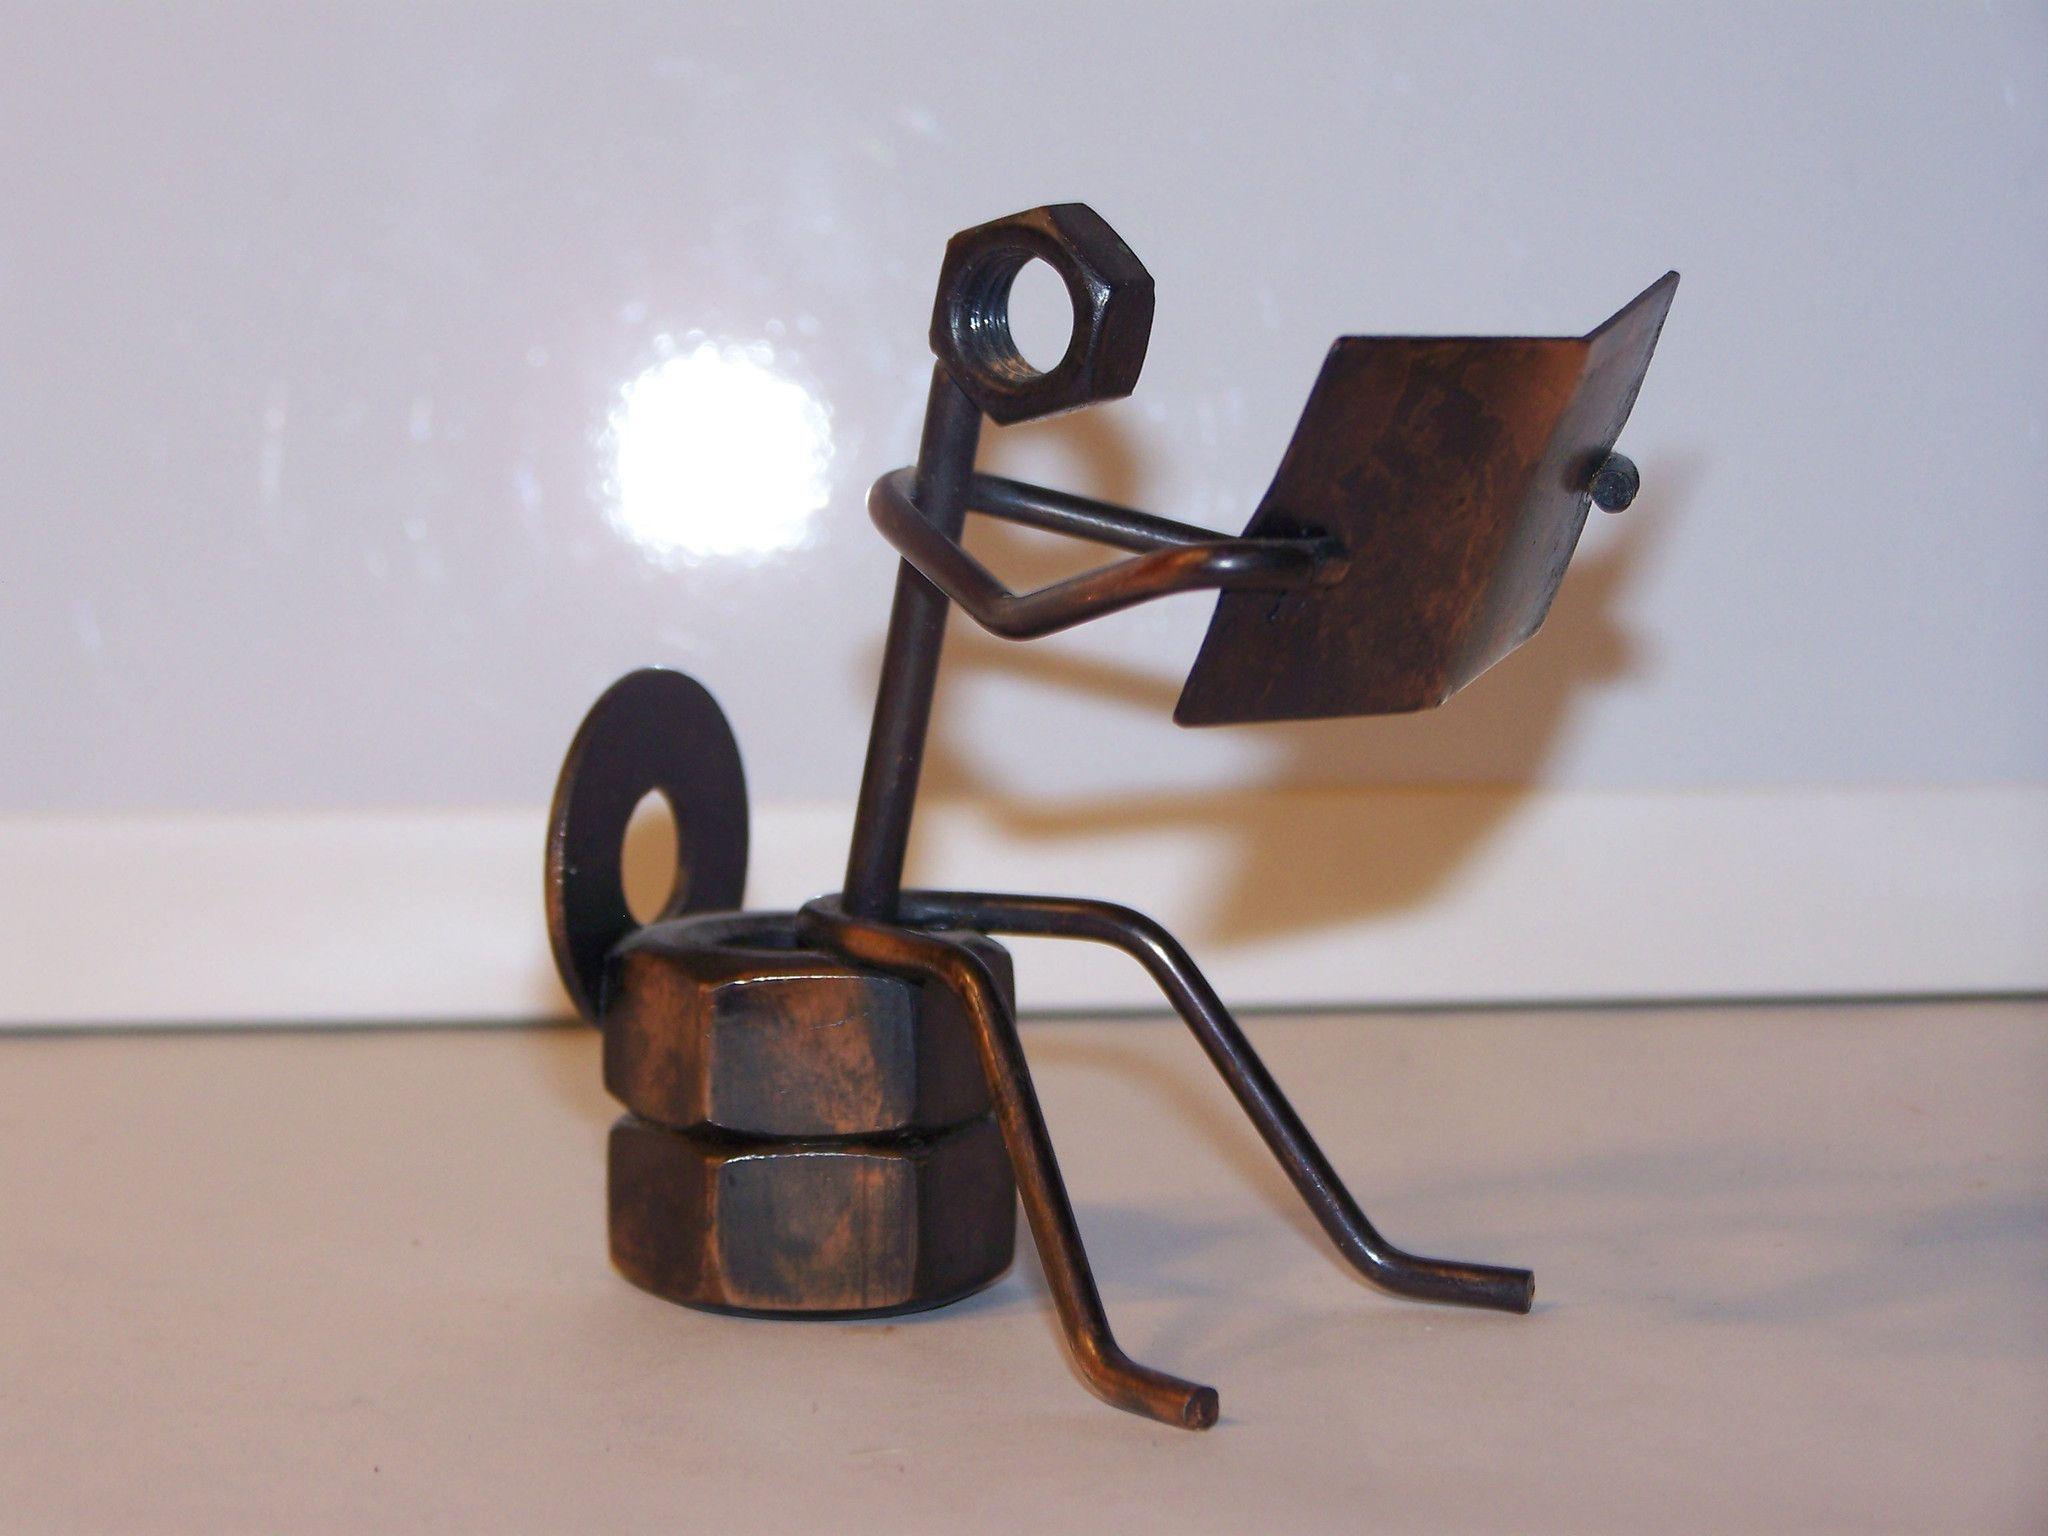 Small scrap metal toilet reader toilet scrap and metals for Metal arts and crafts